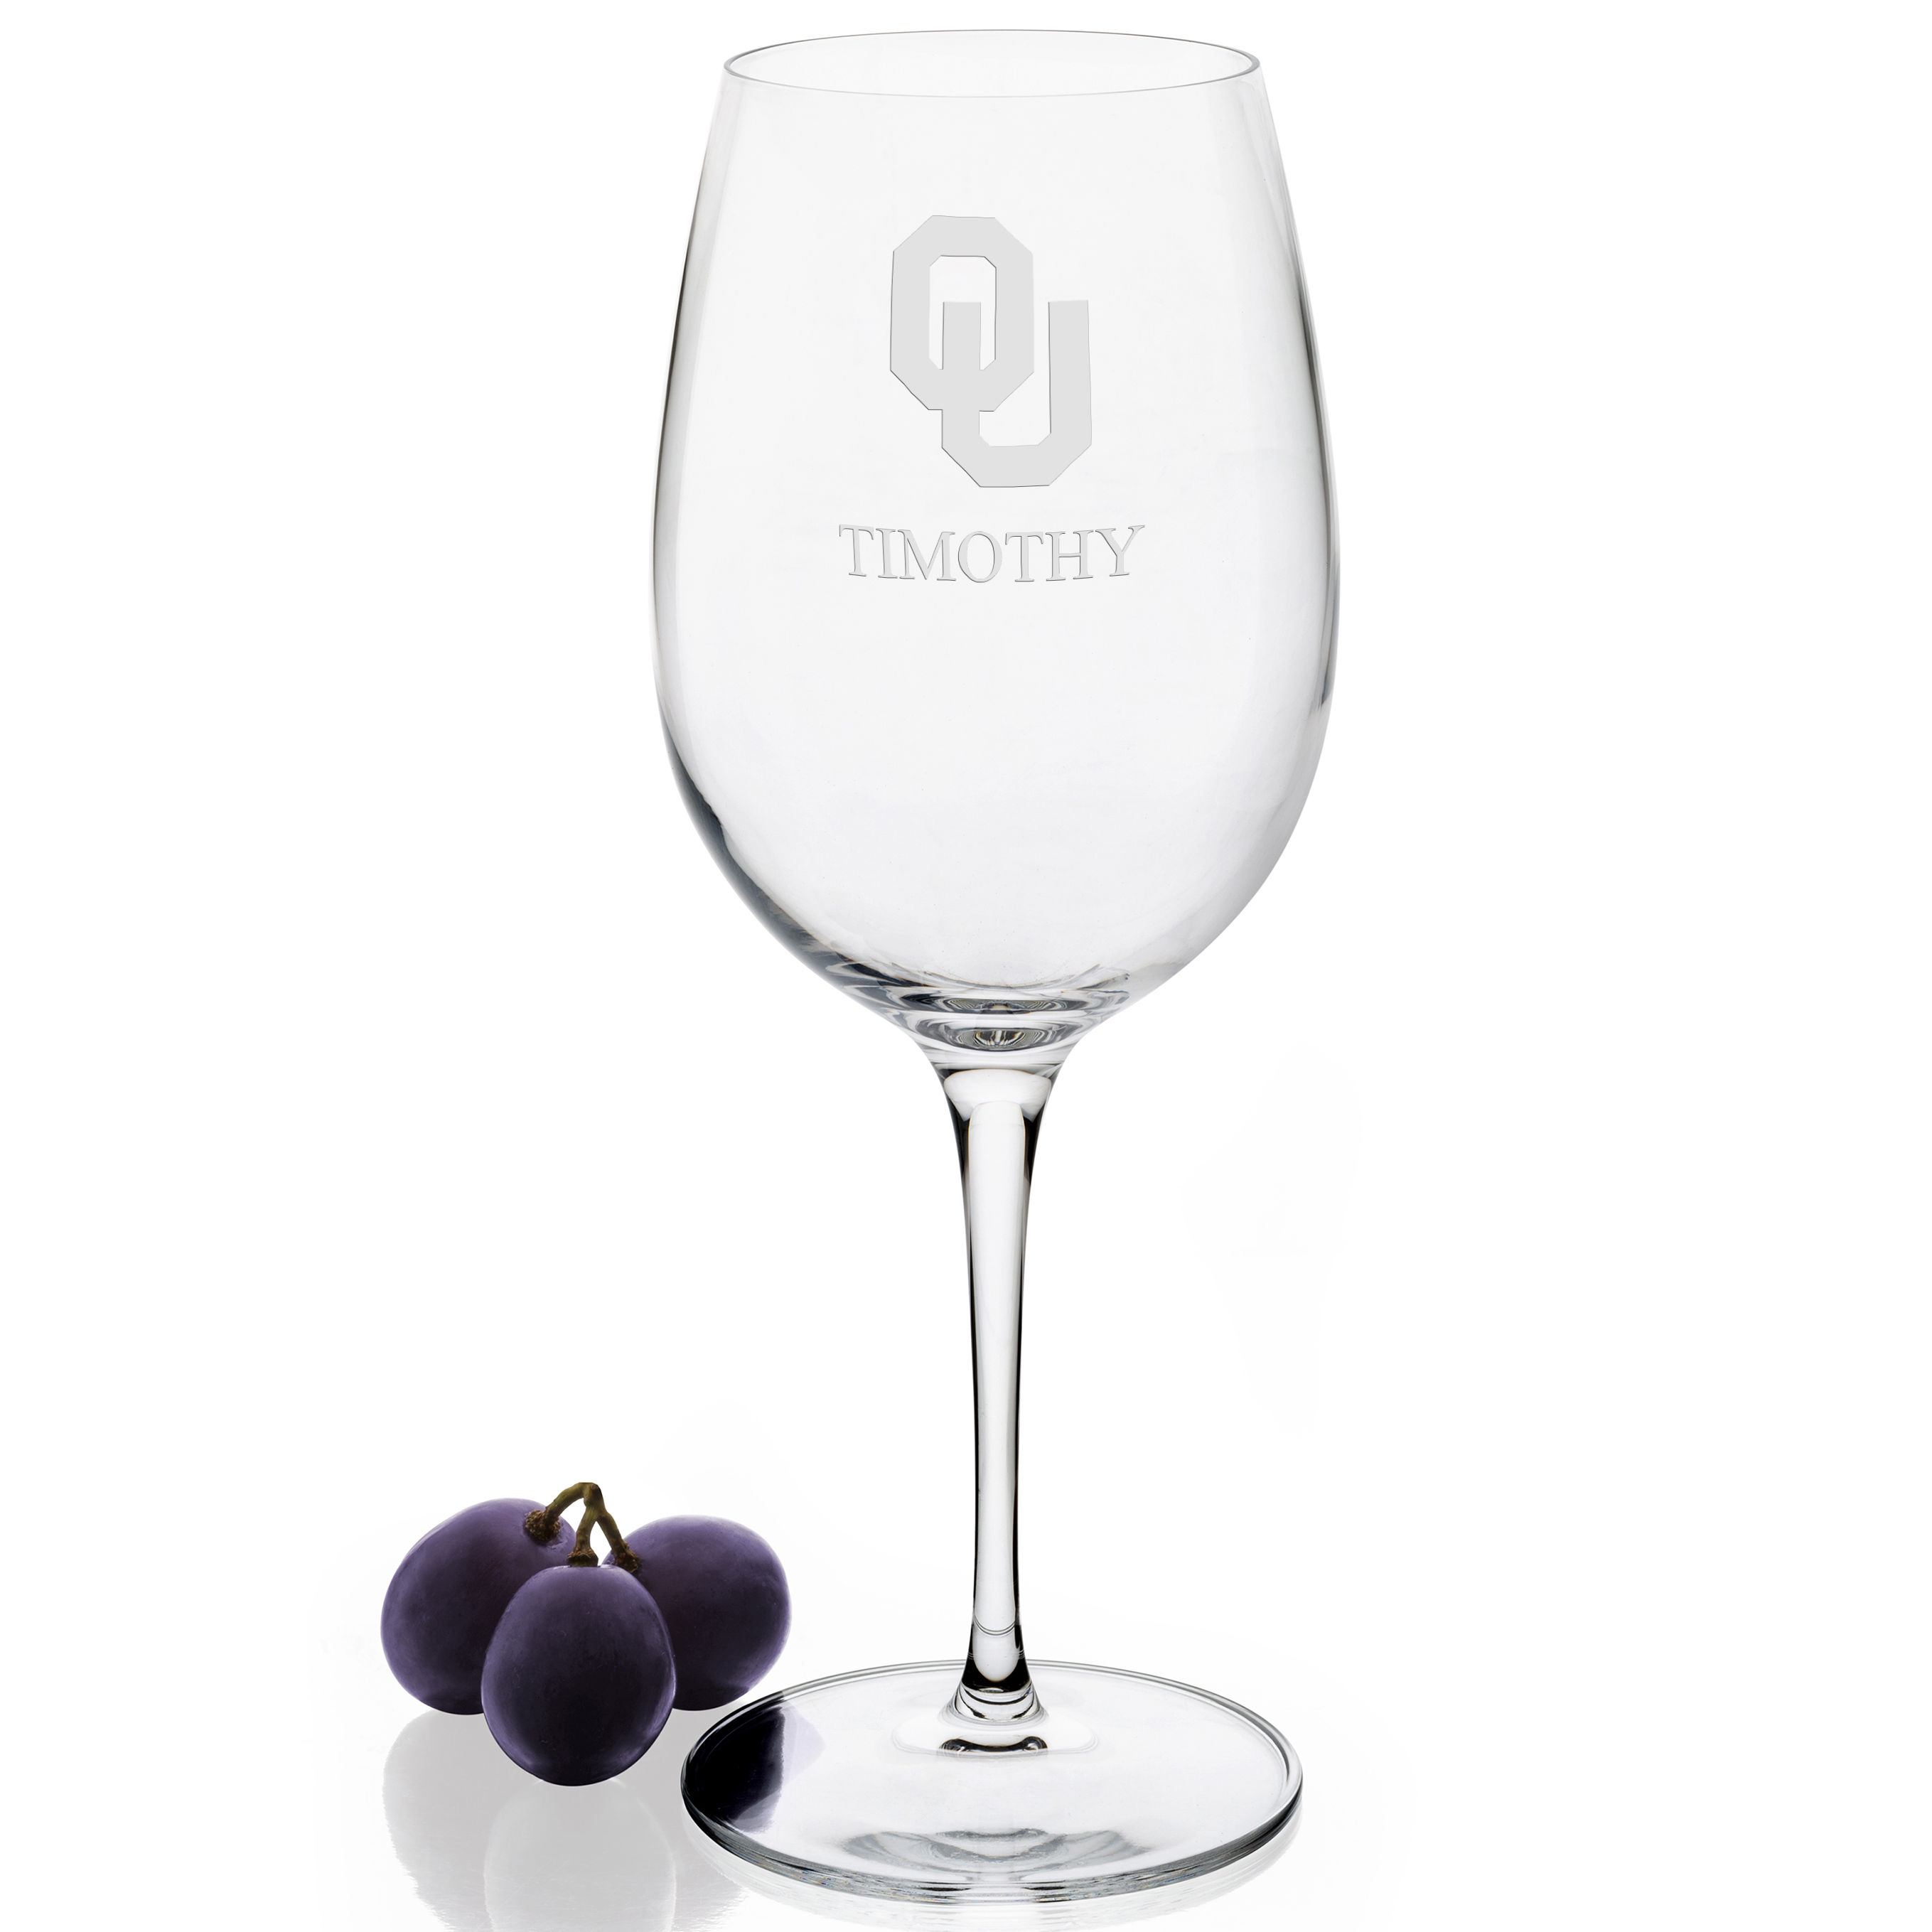 Oklahoma Red Wine Glasses - Set of 4 - Image 2